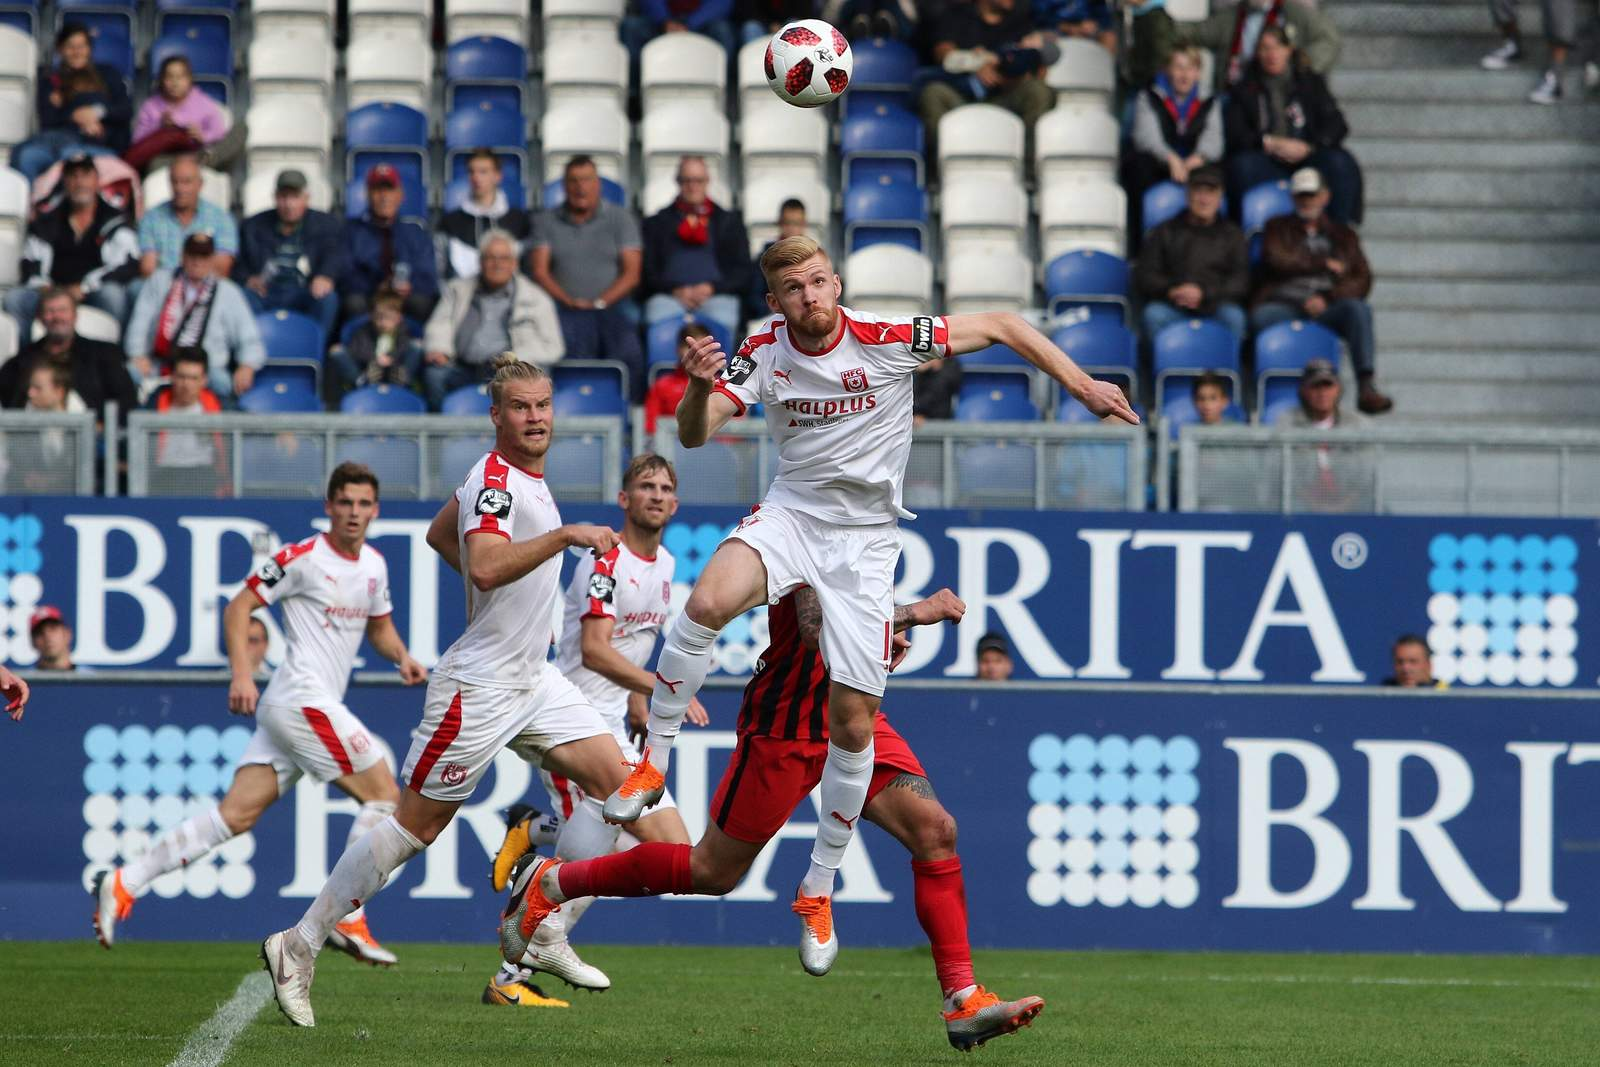 Mathias Fetsch vom HFC beim Kopfball gegen Wehen Wiesbaden